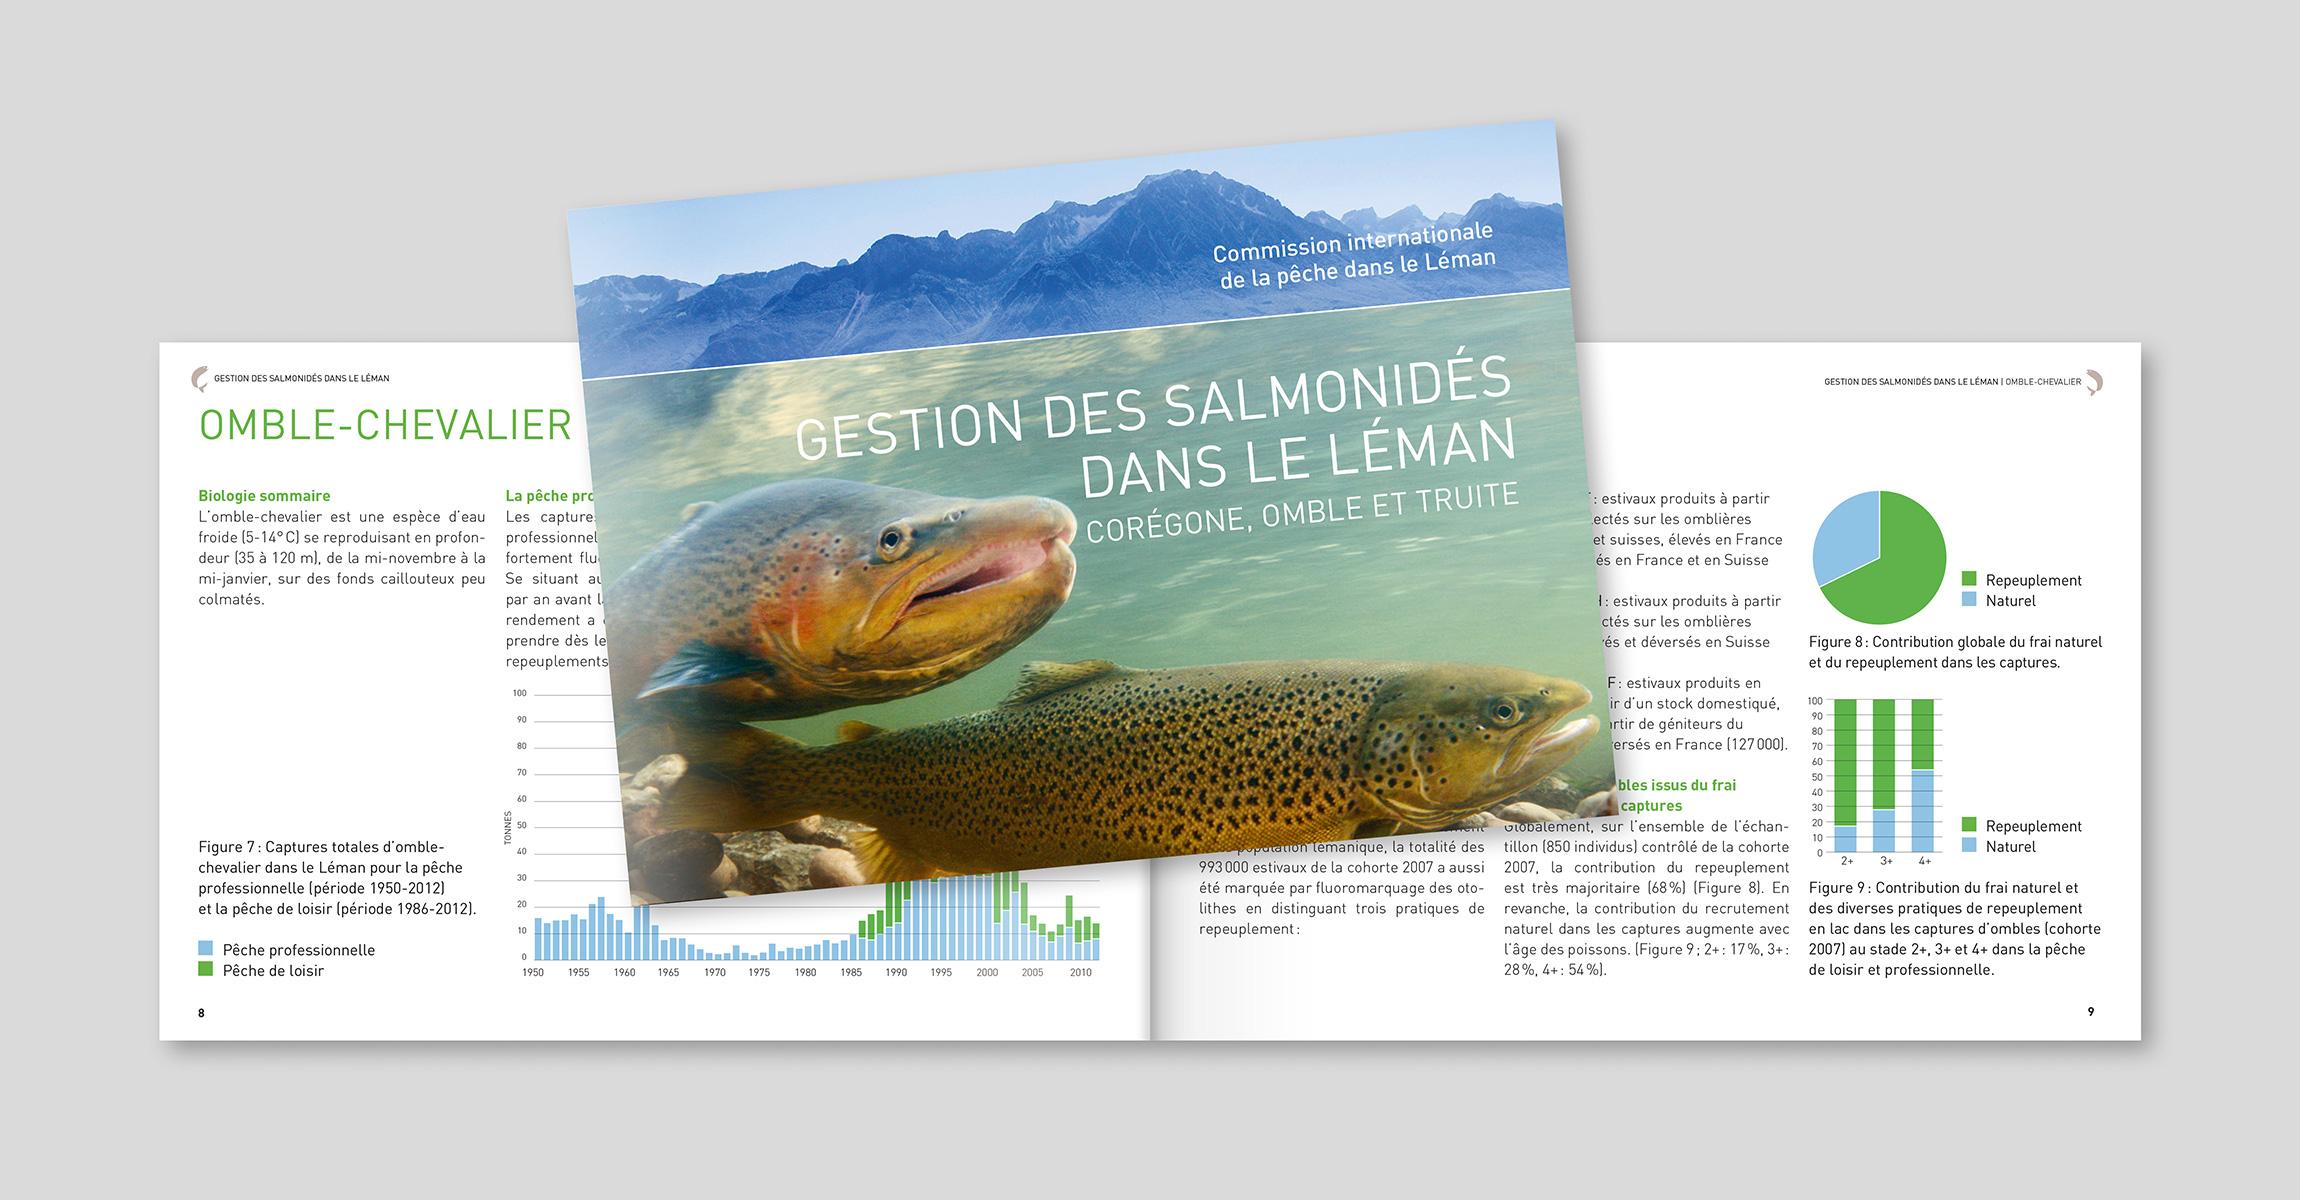 https://www.oikom.ch/wp-content/uploads/2019/08/client_dge_salmon.jpg